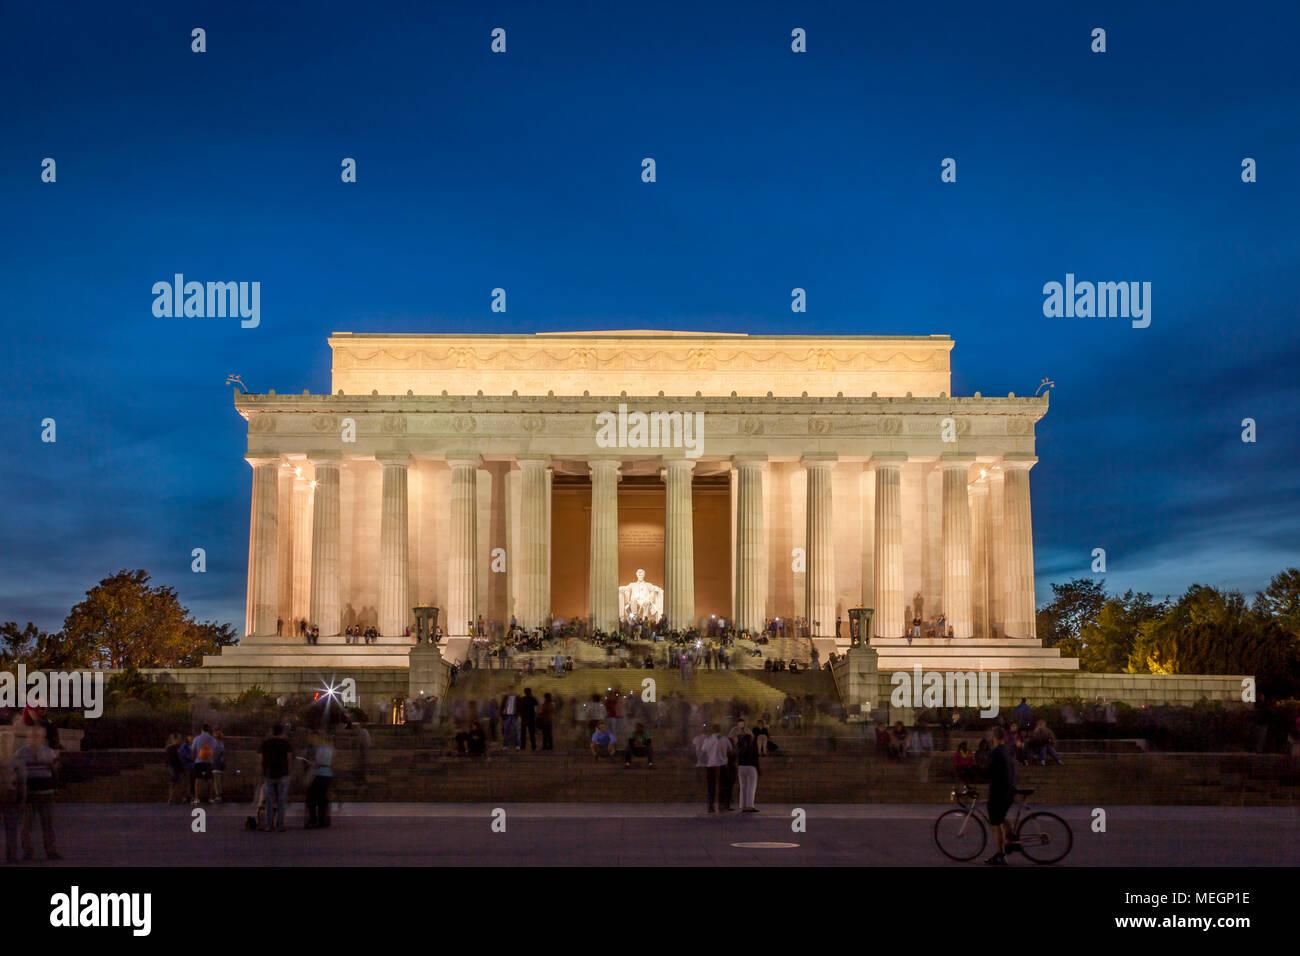 Touristen am Lincoln Memorial in der Dämmerung, Washington, DC, USA Stockbild